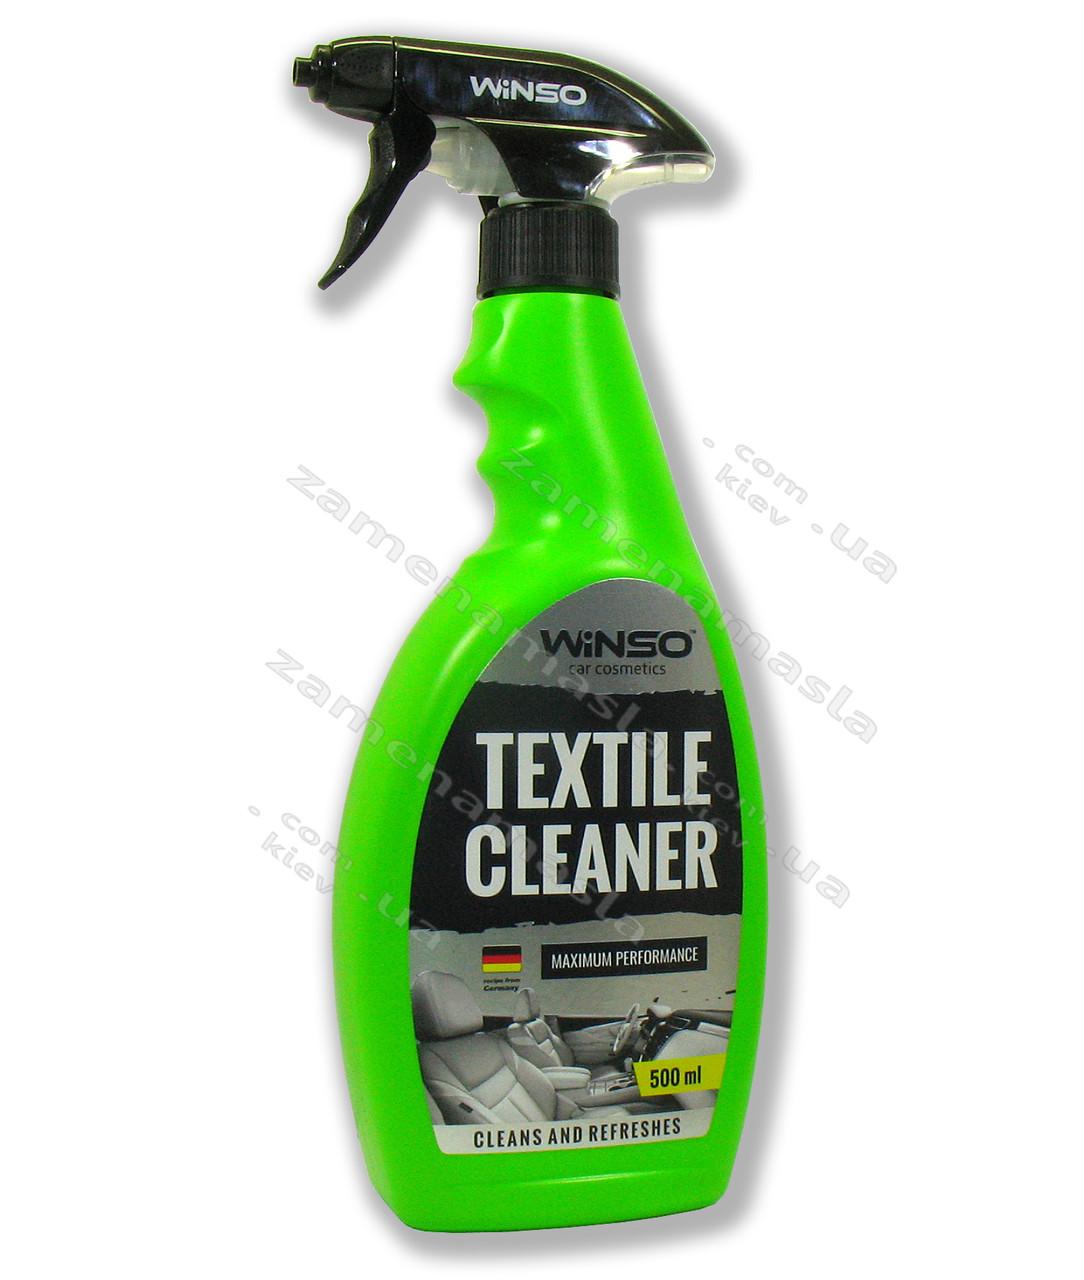 WіNSO TEXTILE CLEANER (очиститель текстиля)